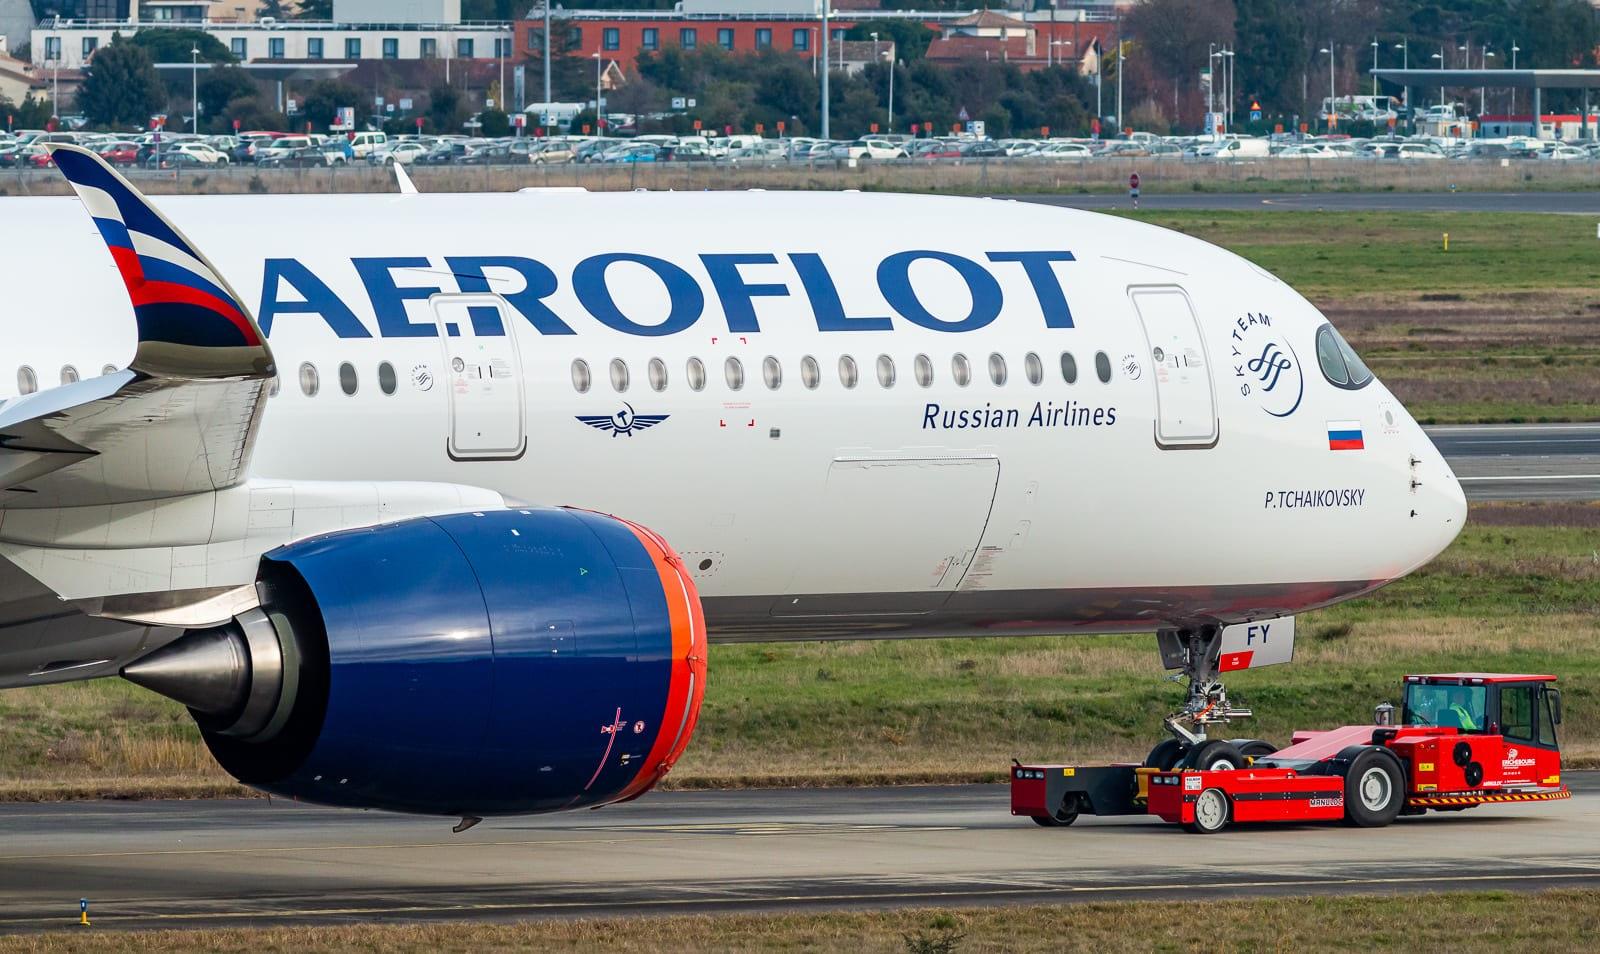 1er_Aeroflot_Airbus_A359_FP_TLS_Janv_202